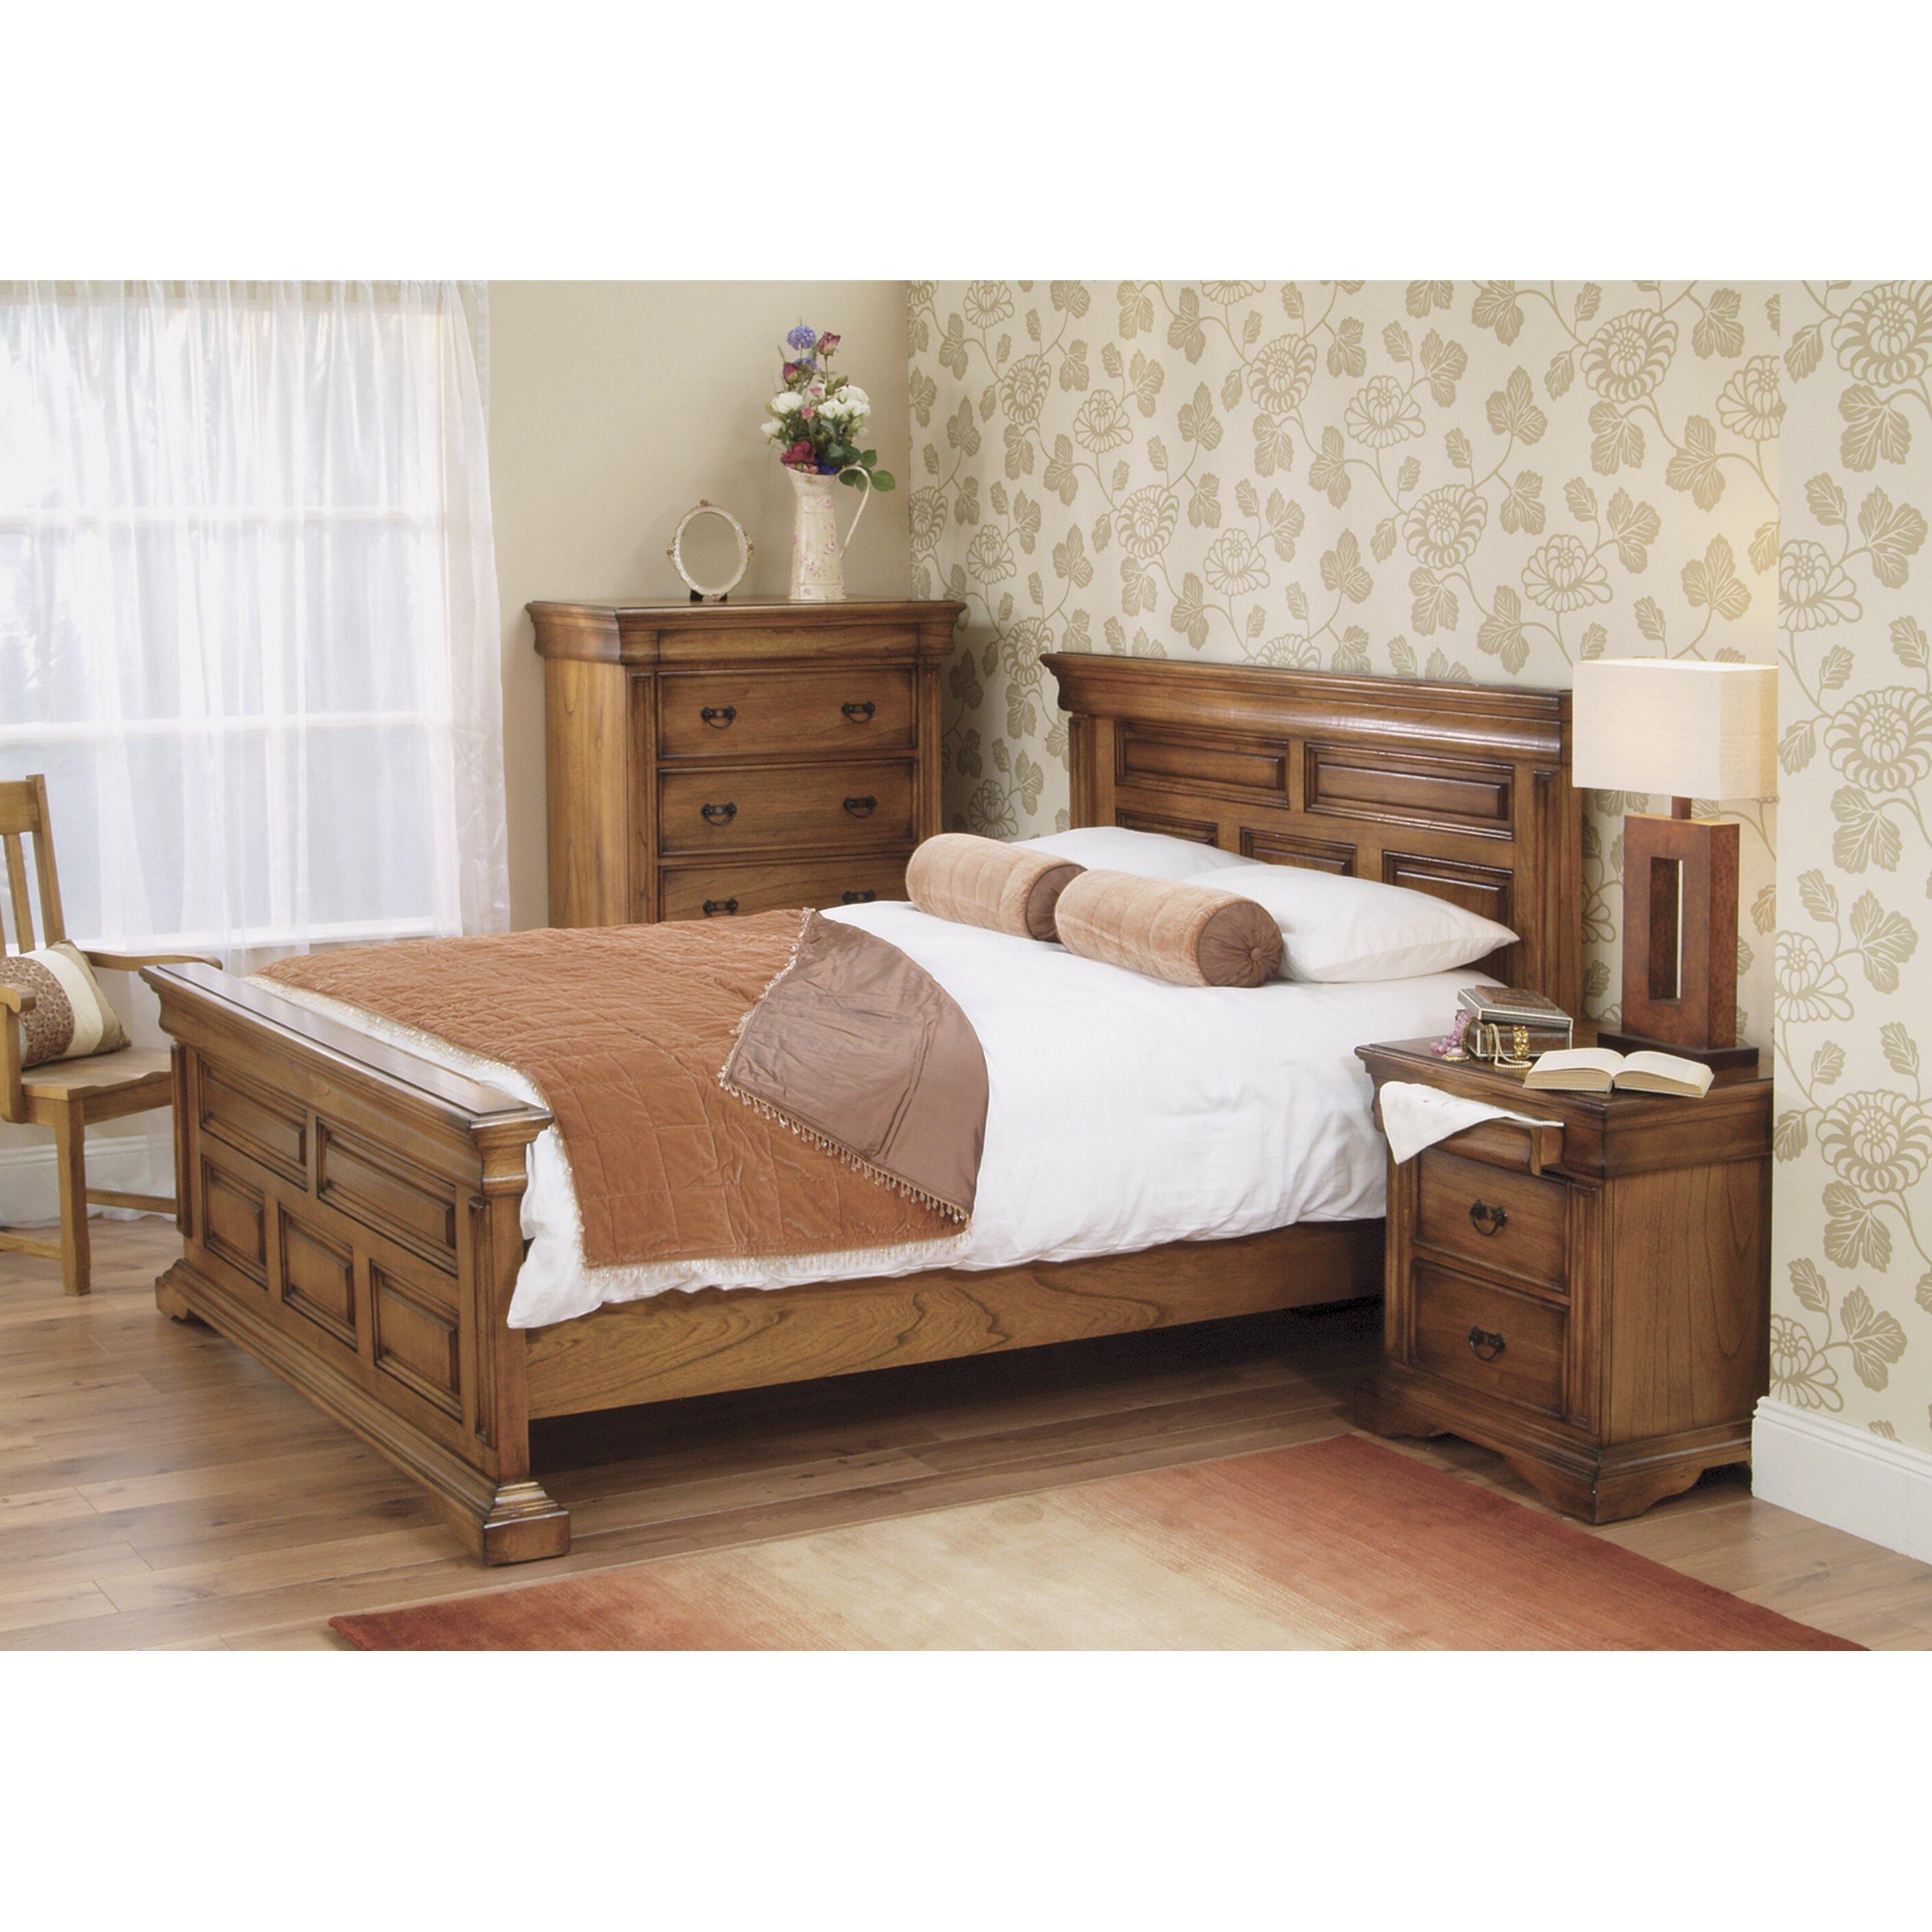 Homestead Living Remus Bed Frame Reviews Wayfair Uk